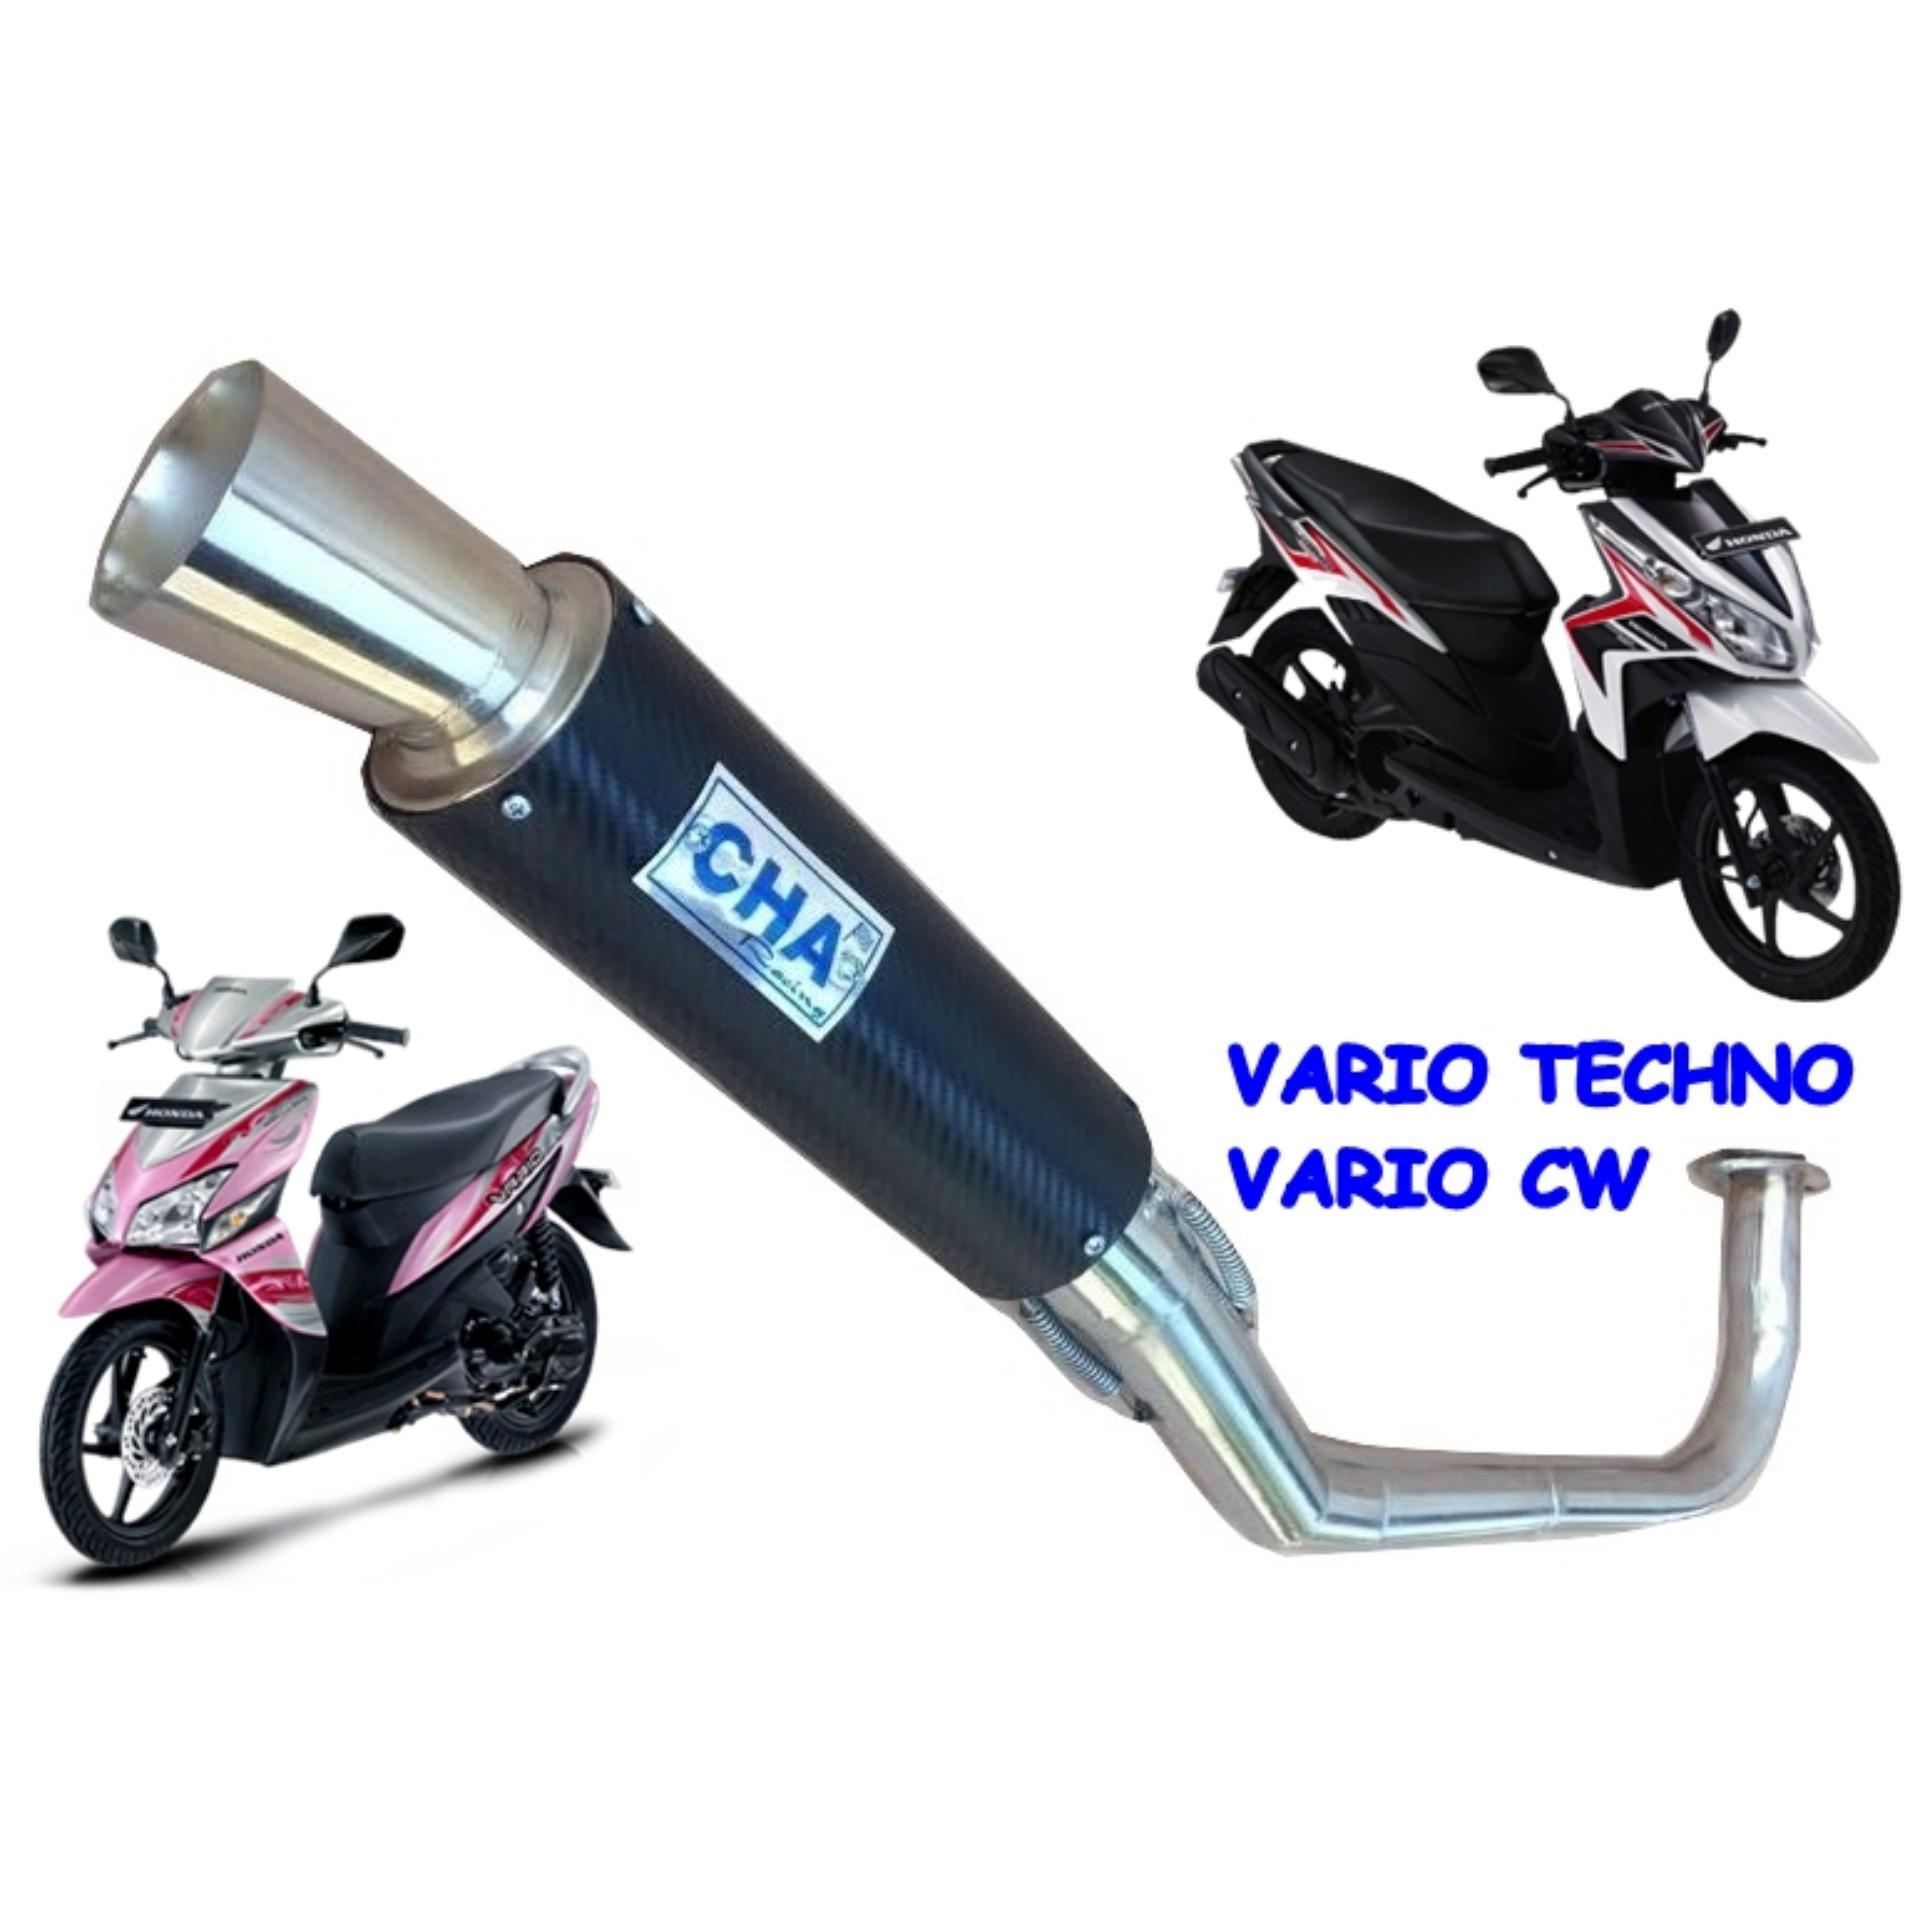 Jual Komponen Knalpot Emisi Kendaraan Lazada R9 Assen Honda New Mega Pro Full System Motor Vario Techno Cw 110 Cha Hitam Karbon